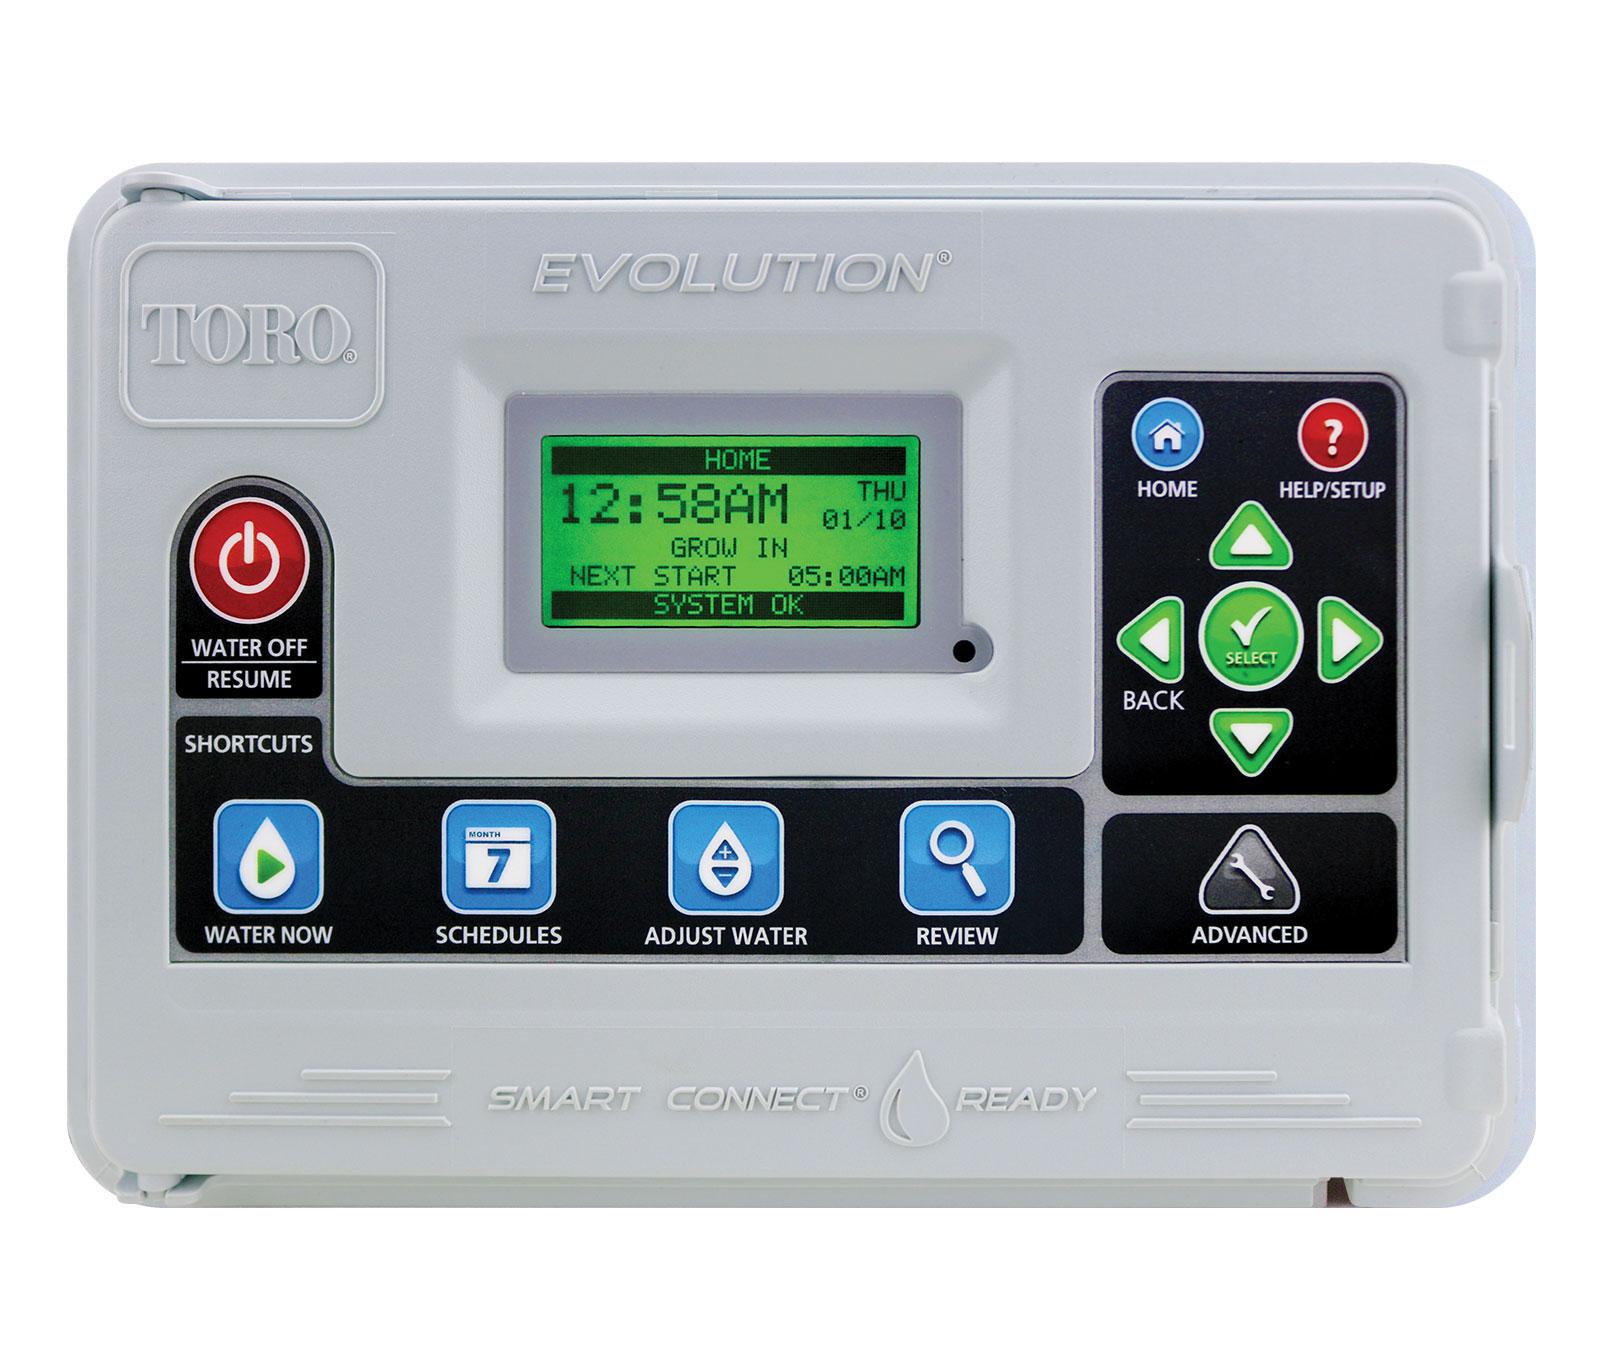 medium resolution of toro evolution series controller rh toro com scotts 1742 wiring diagram toro lawn mower wiring diagram